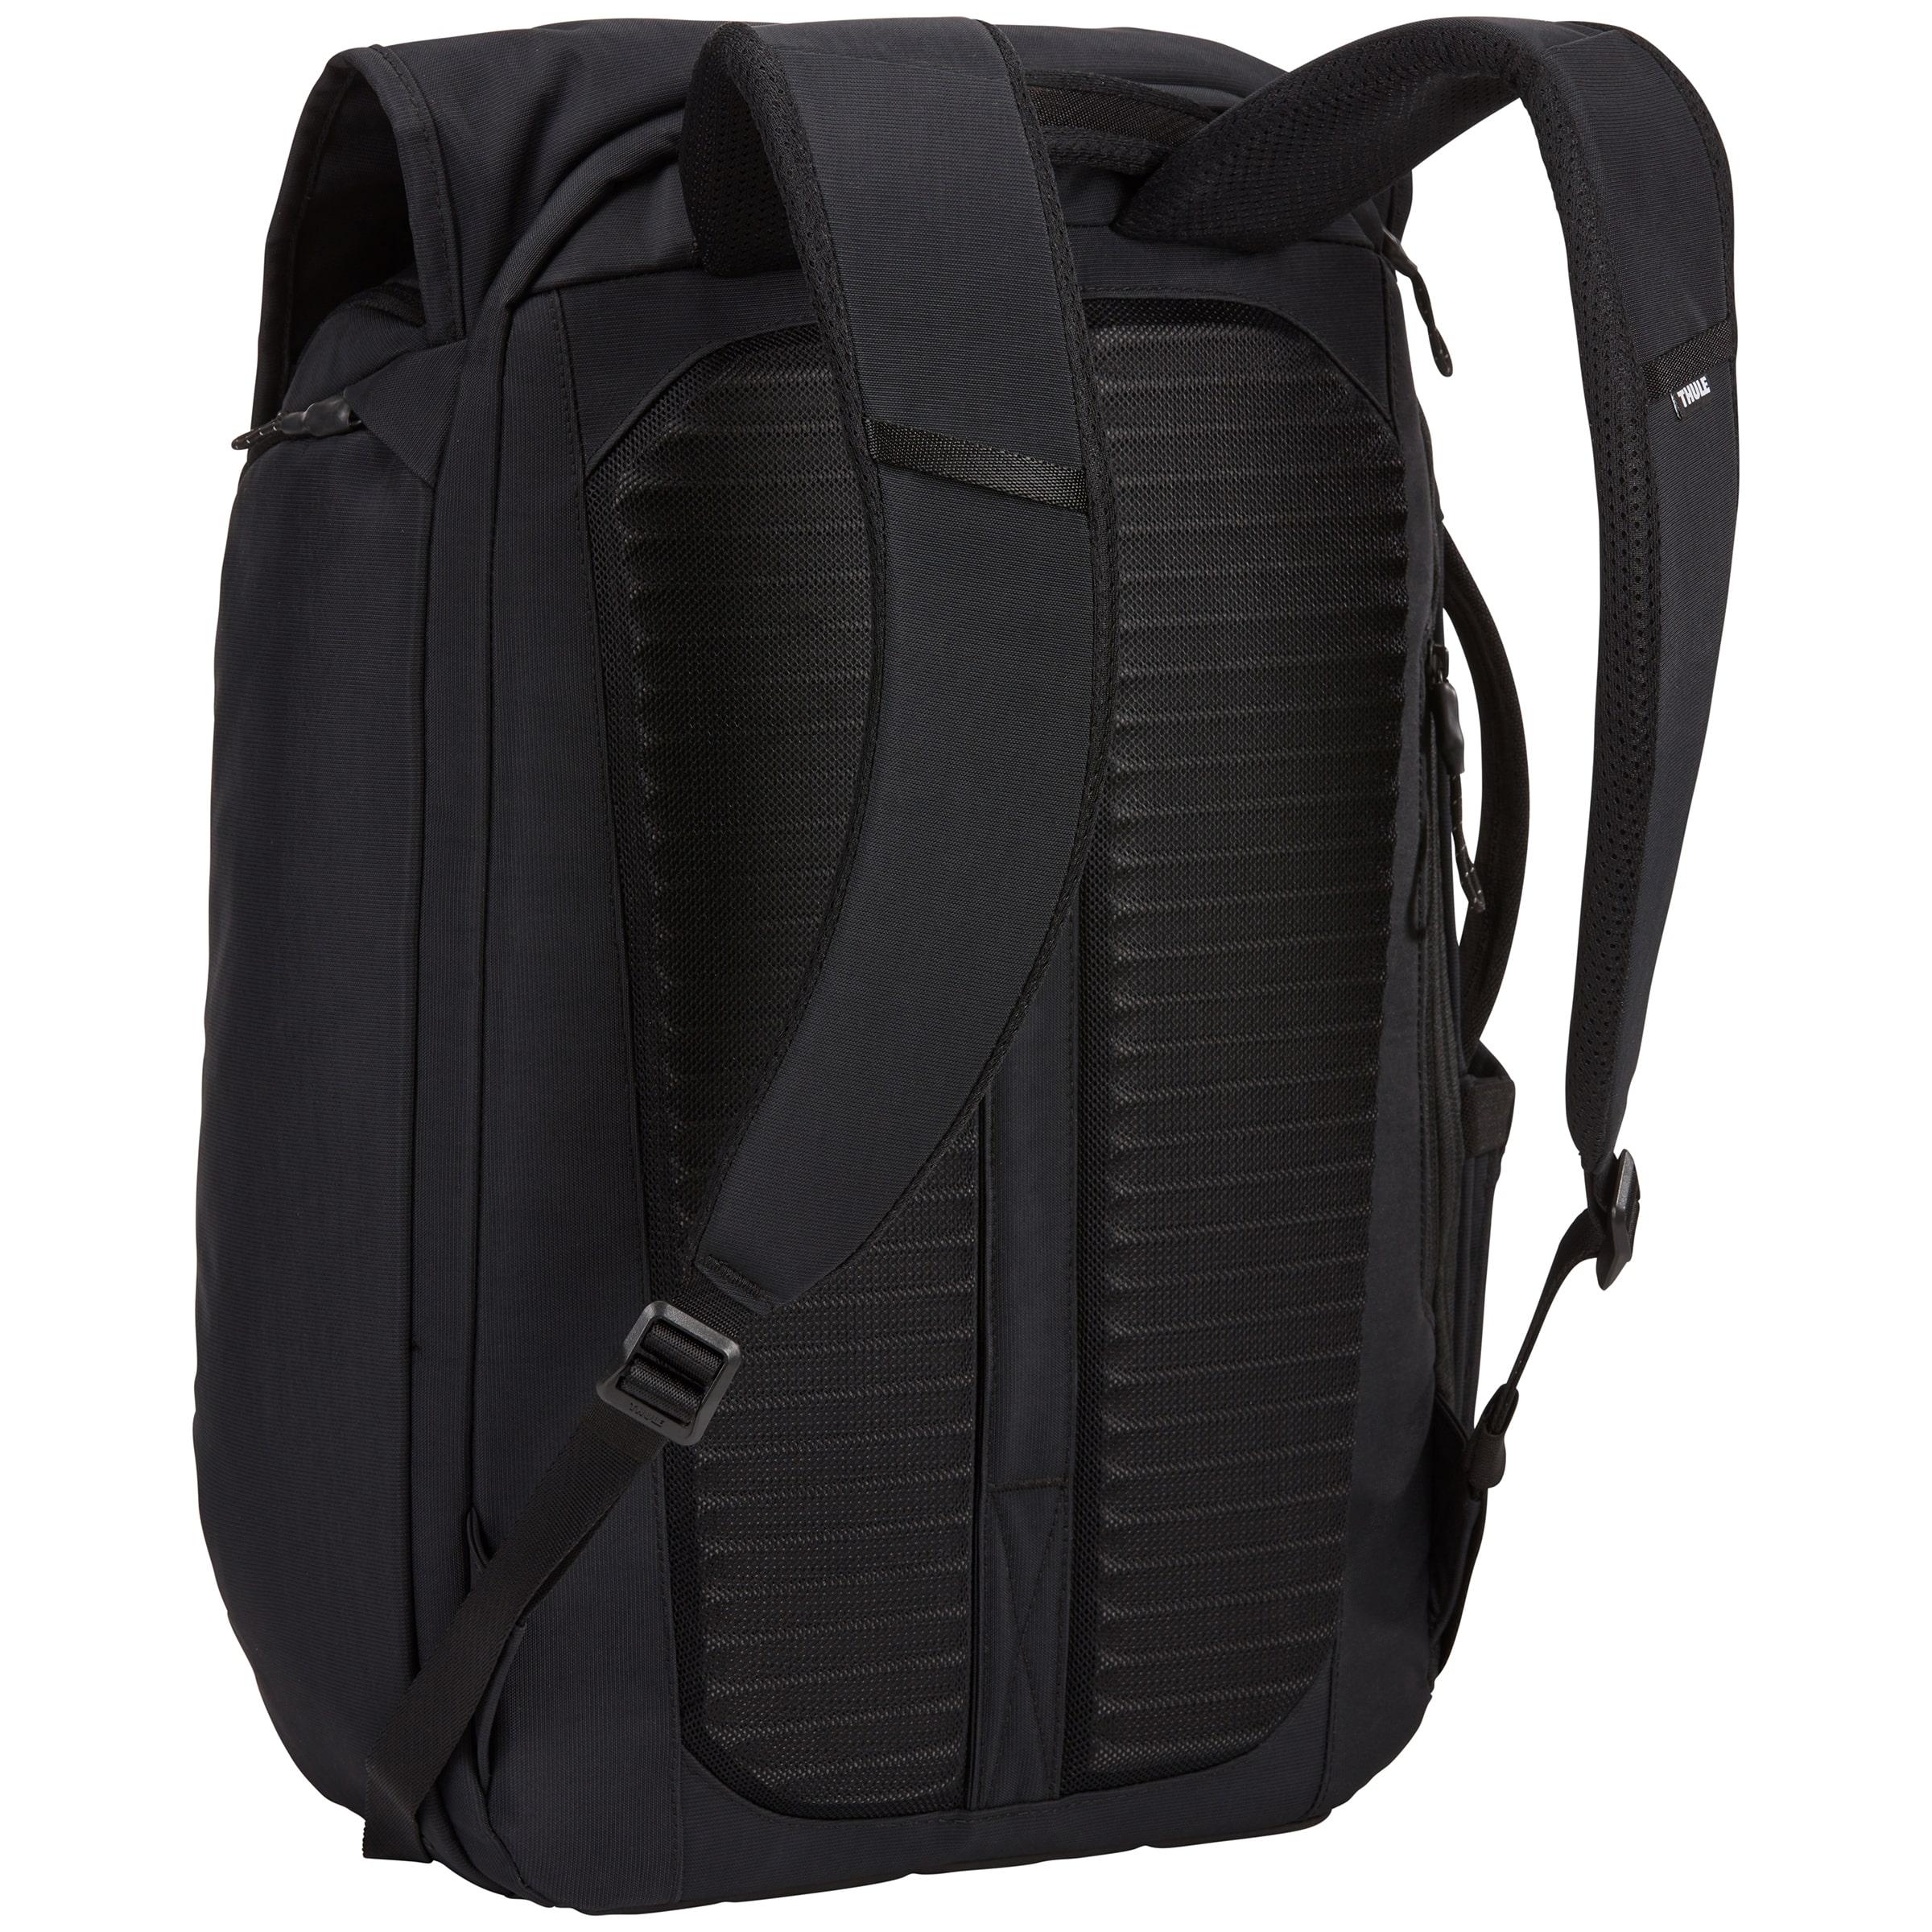 File name: paramount-backpack-27l-black-6.jpg Dimensions: 2400 x 2400 pixels File size: 807.61 KB